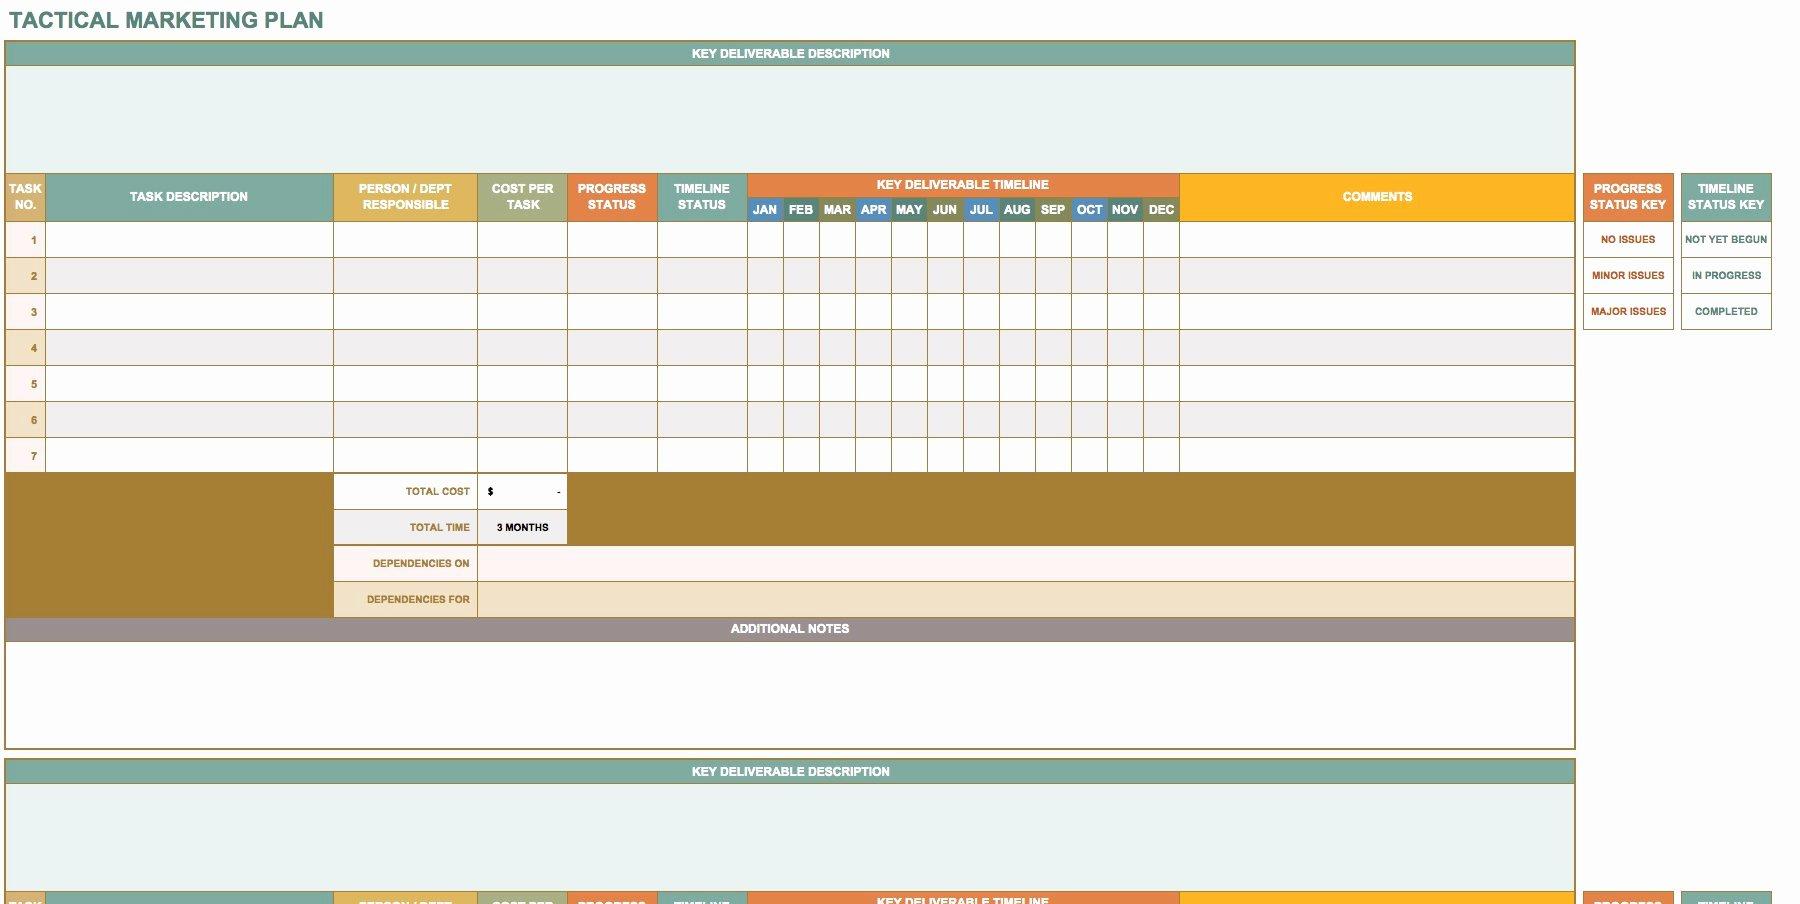 Marketing Campaign Proposal Template Elegant Free Marketing Plan Templates for Excel Smartsheet